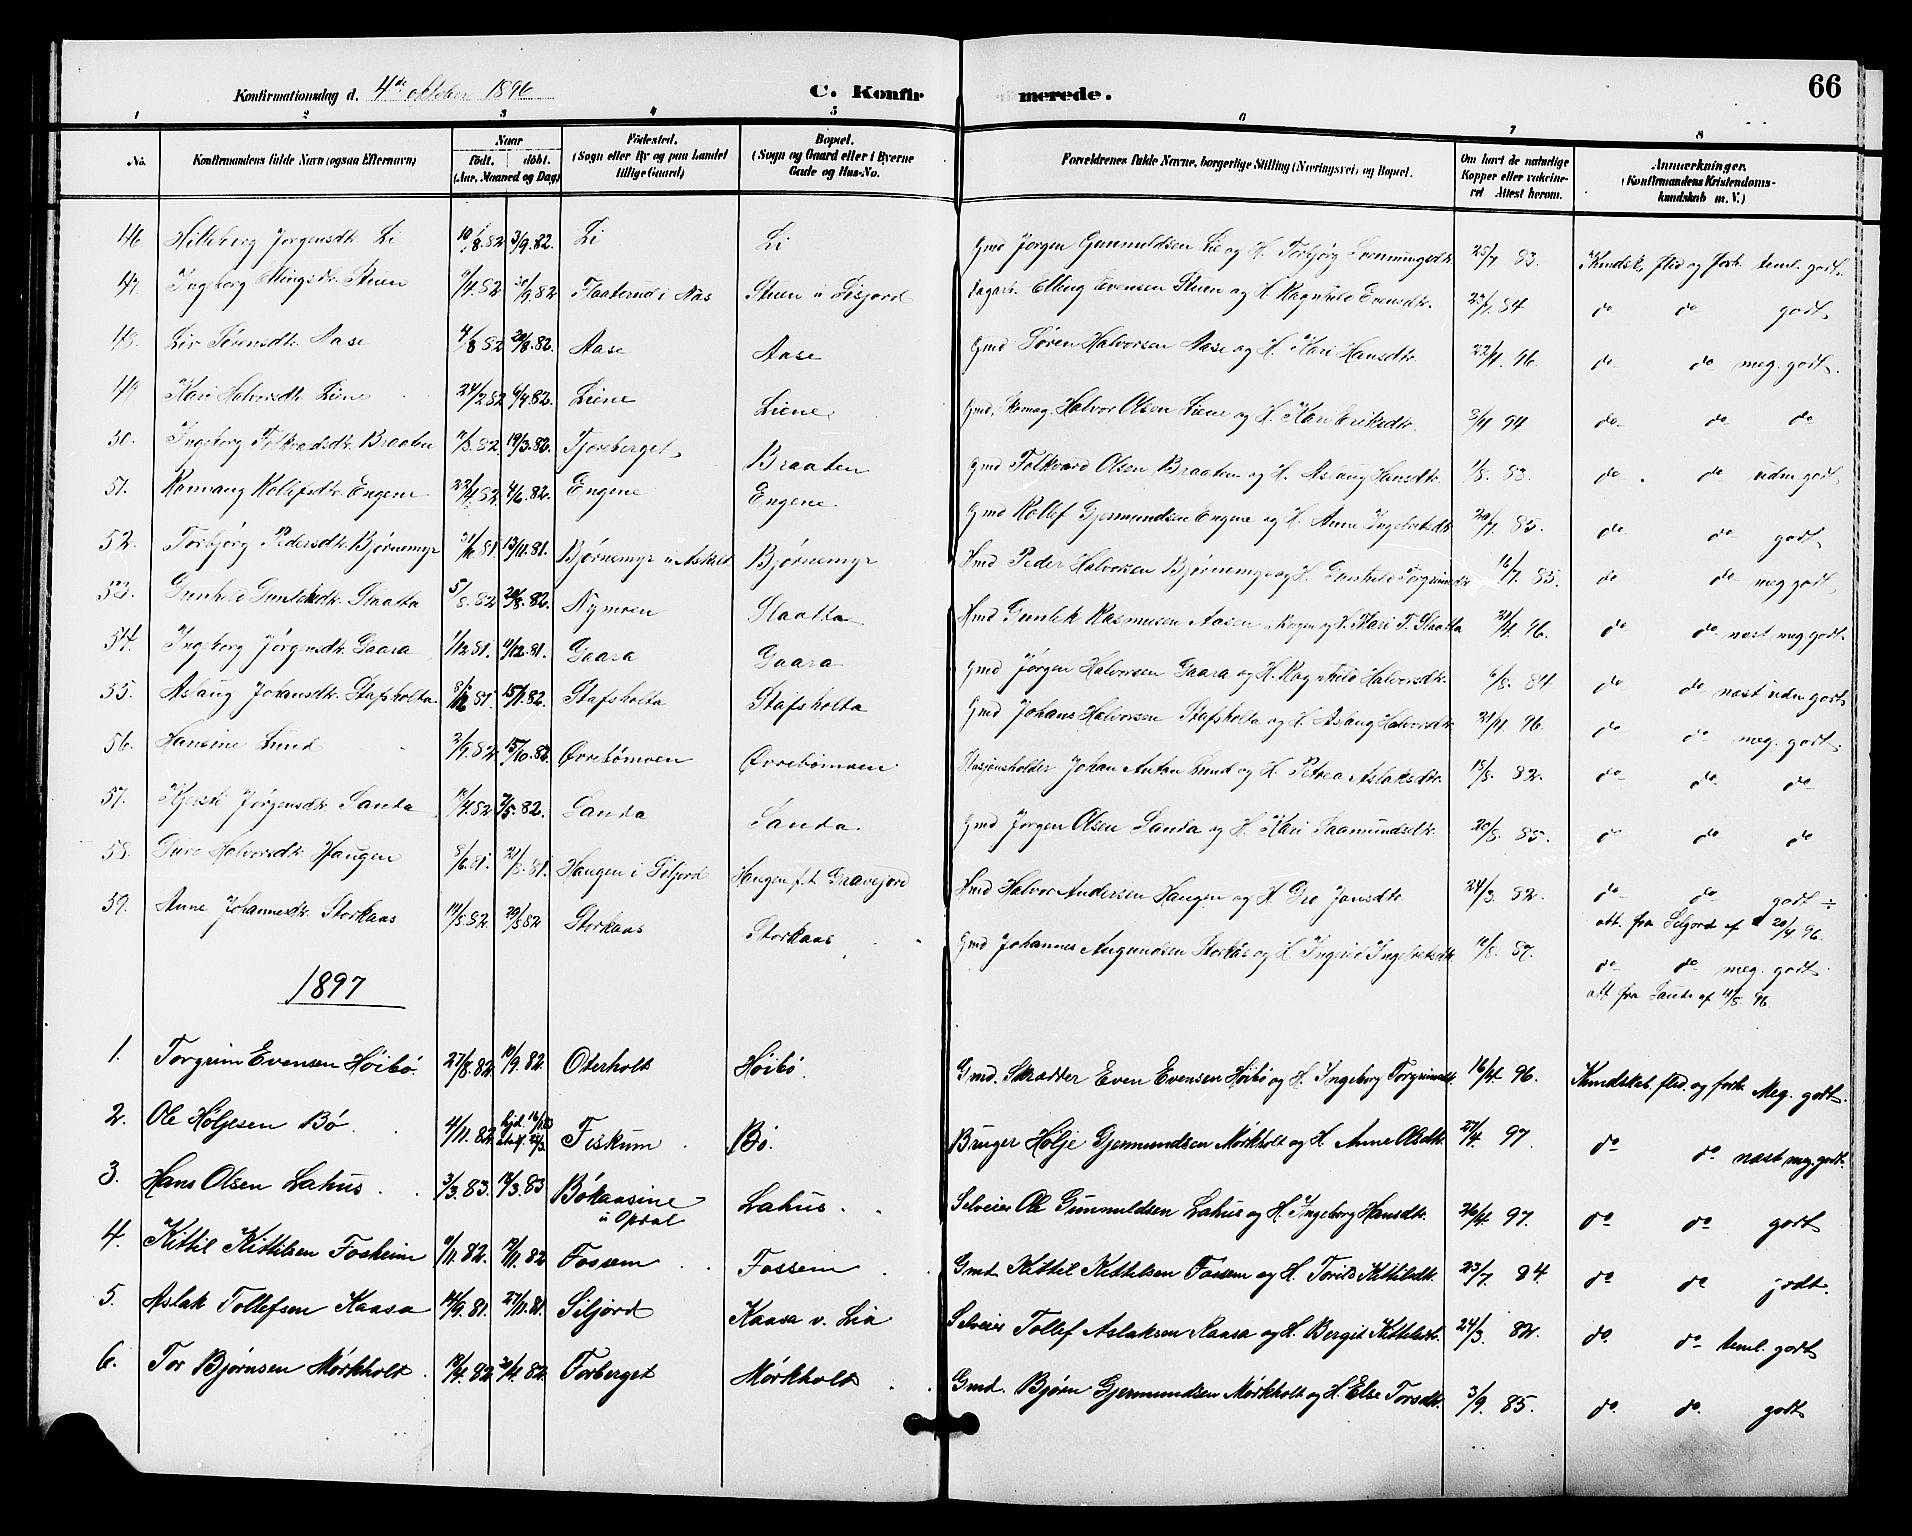 SAKO, Bø kirkebøker, G/Ga/L0006: Klokkerbok nr. 6, 1898-1909, s. 66